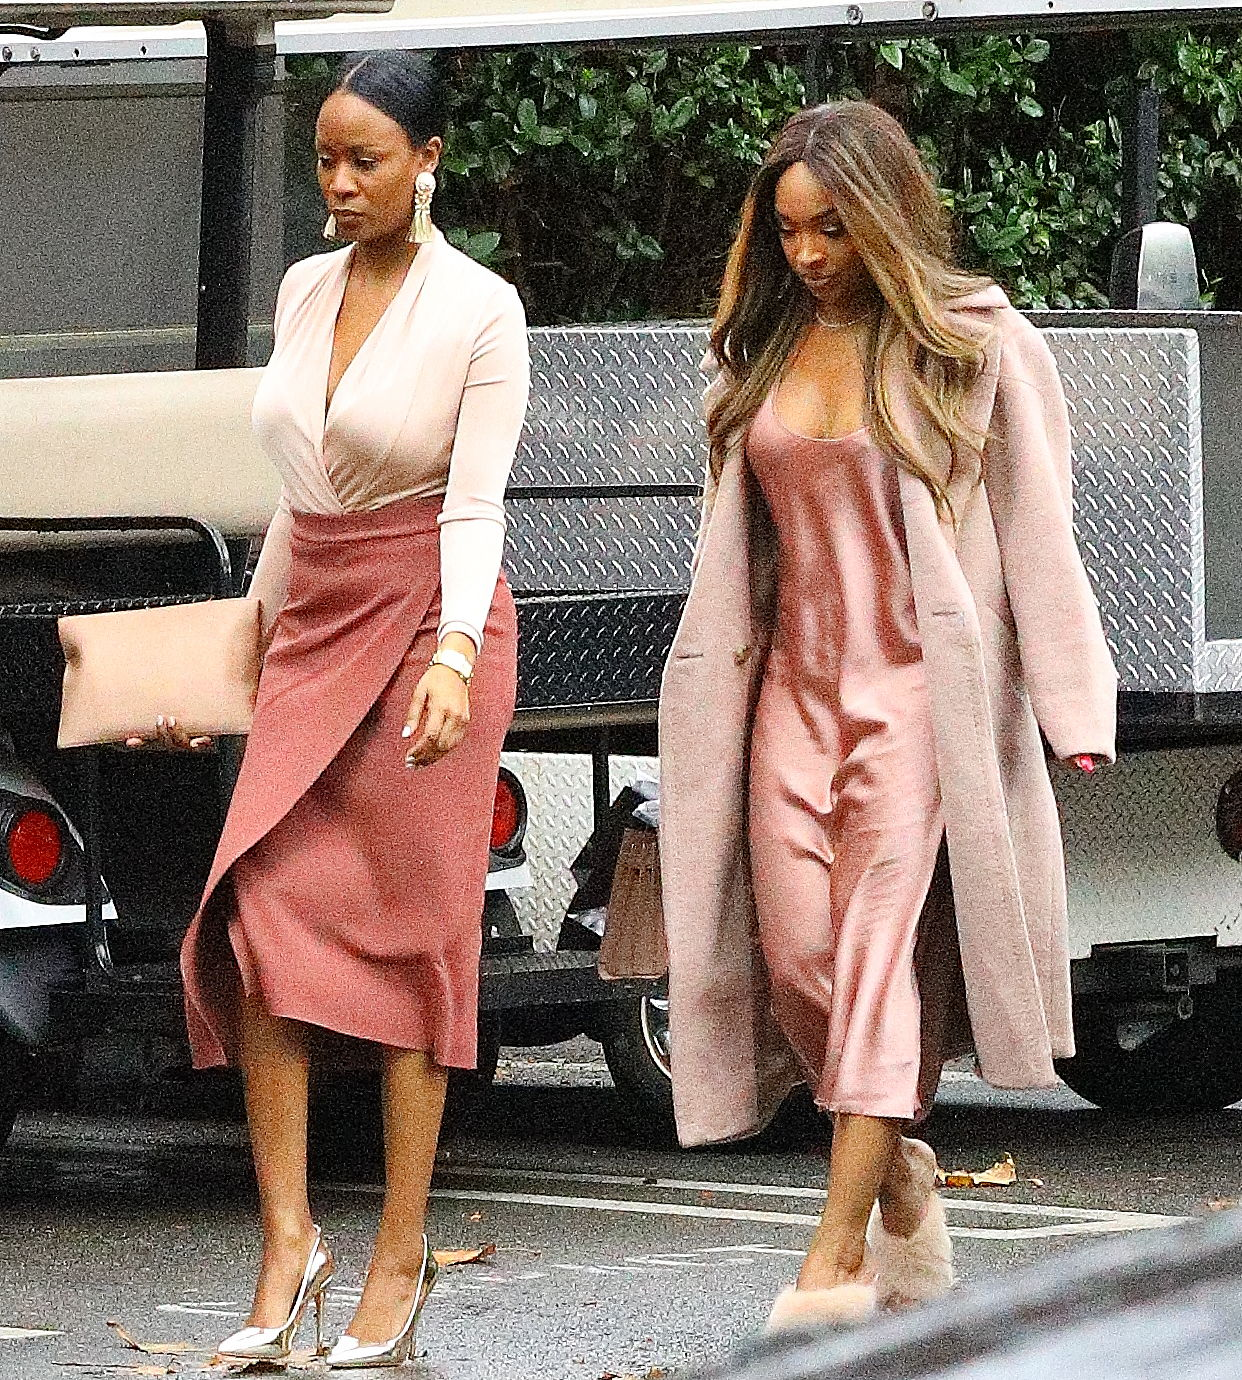 Malika and Maliyah hayk arrive to Khloe Kardashian baby shower in Los Angeles CA <P> Pictured: Malika and Maliyah hayk arrive to Khloe Kardashian baby shower in Los Angeles CA <B>Ref: SPL1669952  100318  </B><BR/> Picture by: Pap Nation / Splash News<BR/> </P><P> <B>Splash News and Pictures</B><BR/> Los Angeles:310-821-2666<BR/> New York:212-619-2666<BR/> London:870-934-2666<BR/> <span id=